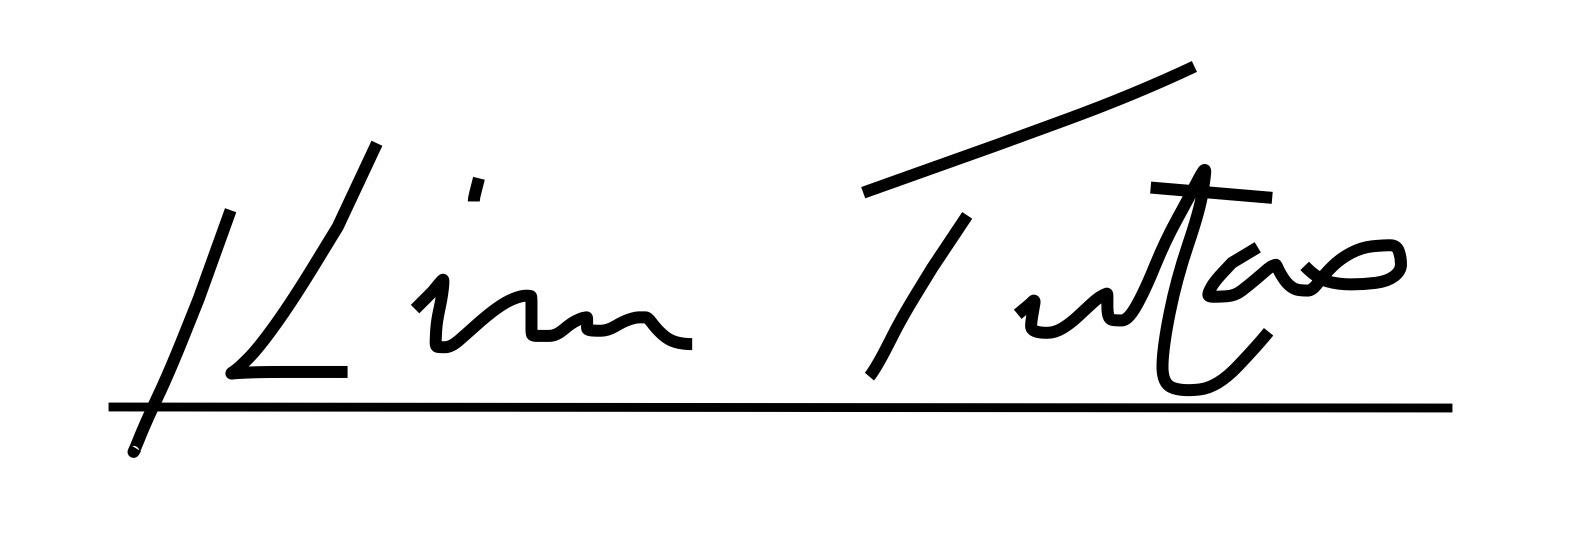 Broker Signature